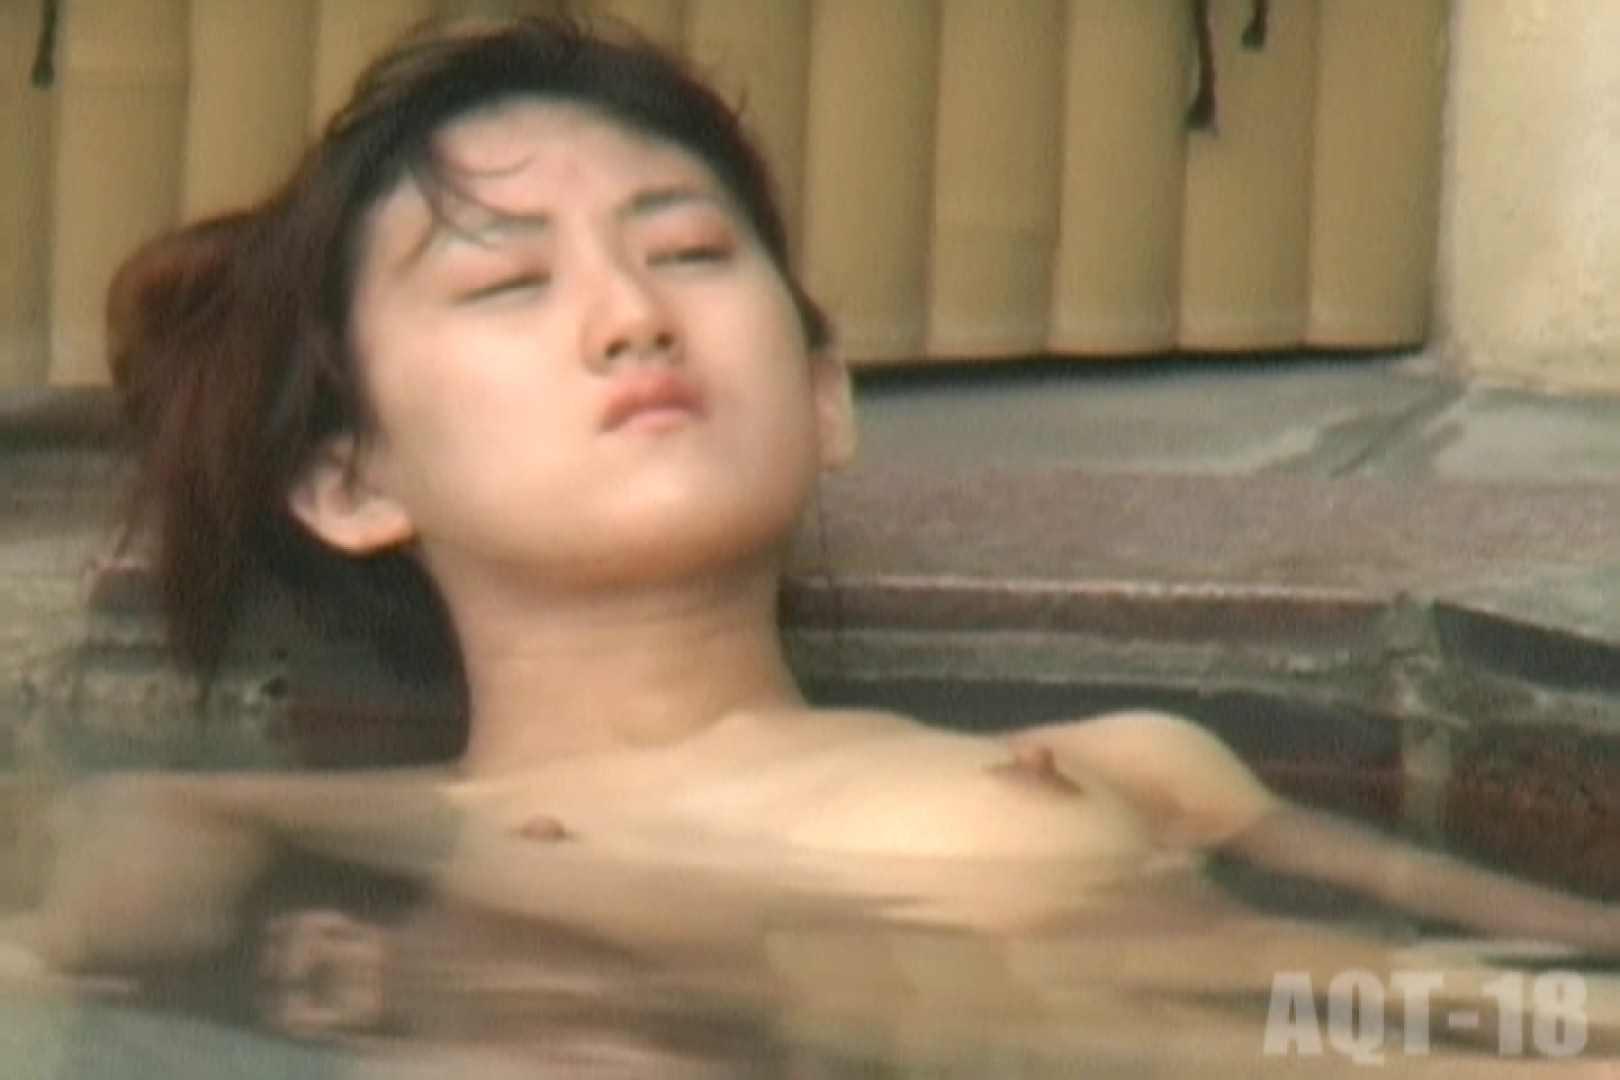 Aquaな露天風呂Vol.862 盗撮 AV無料動画キャプチャ 92PICs 71